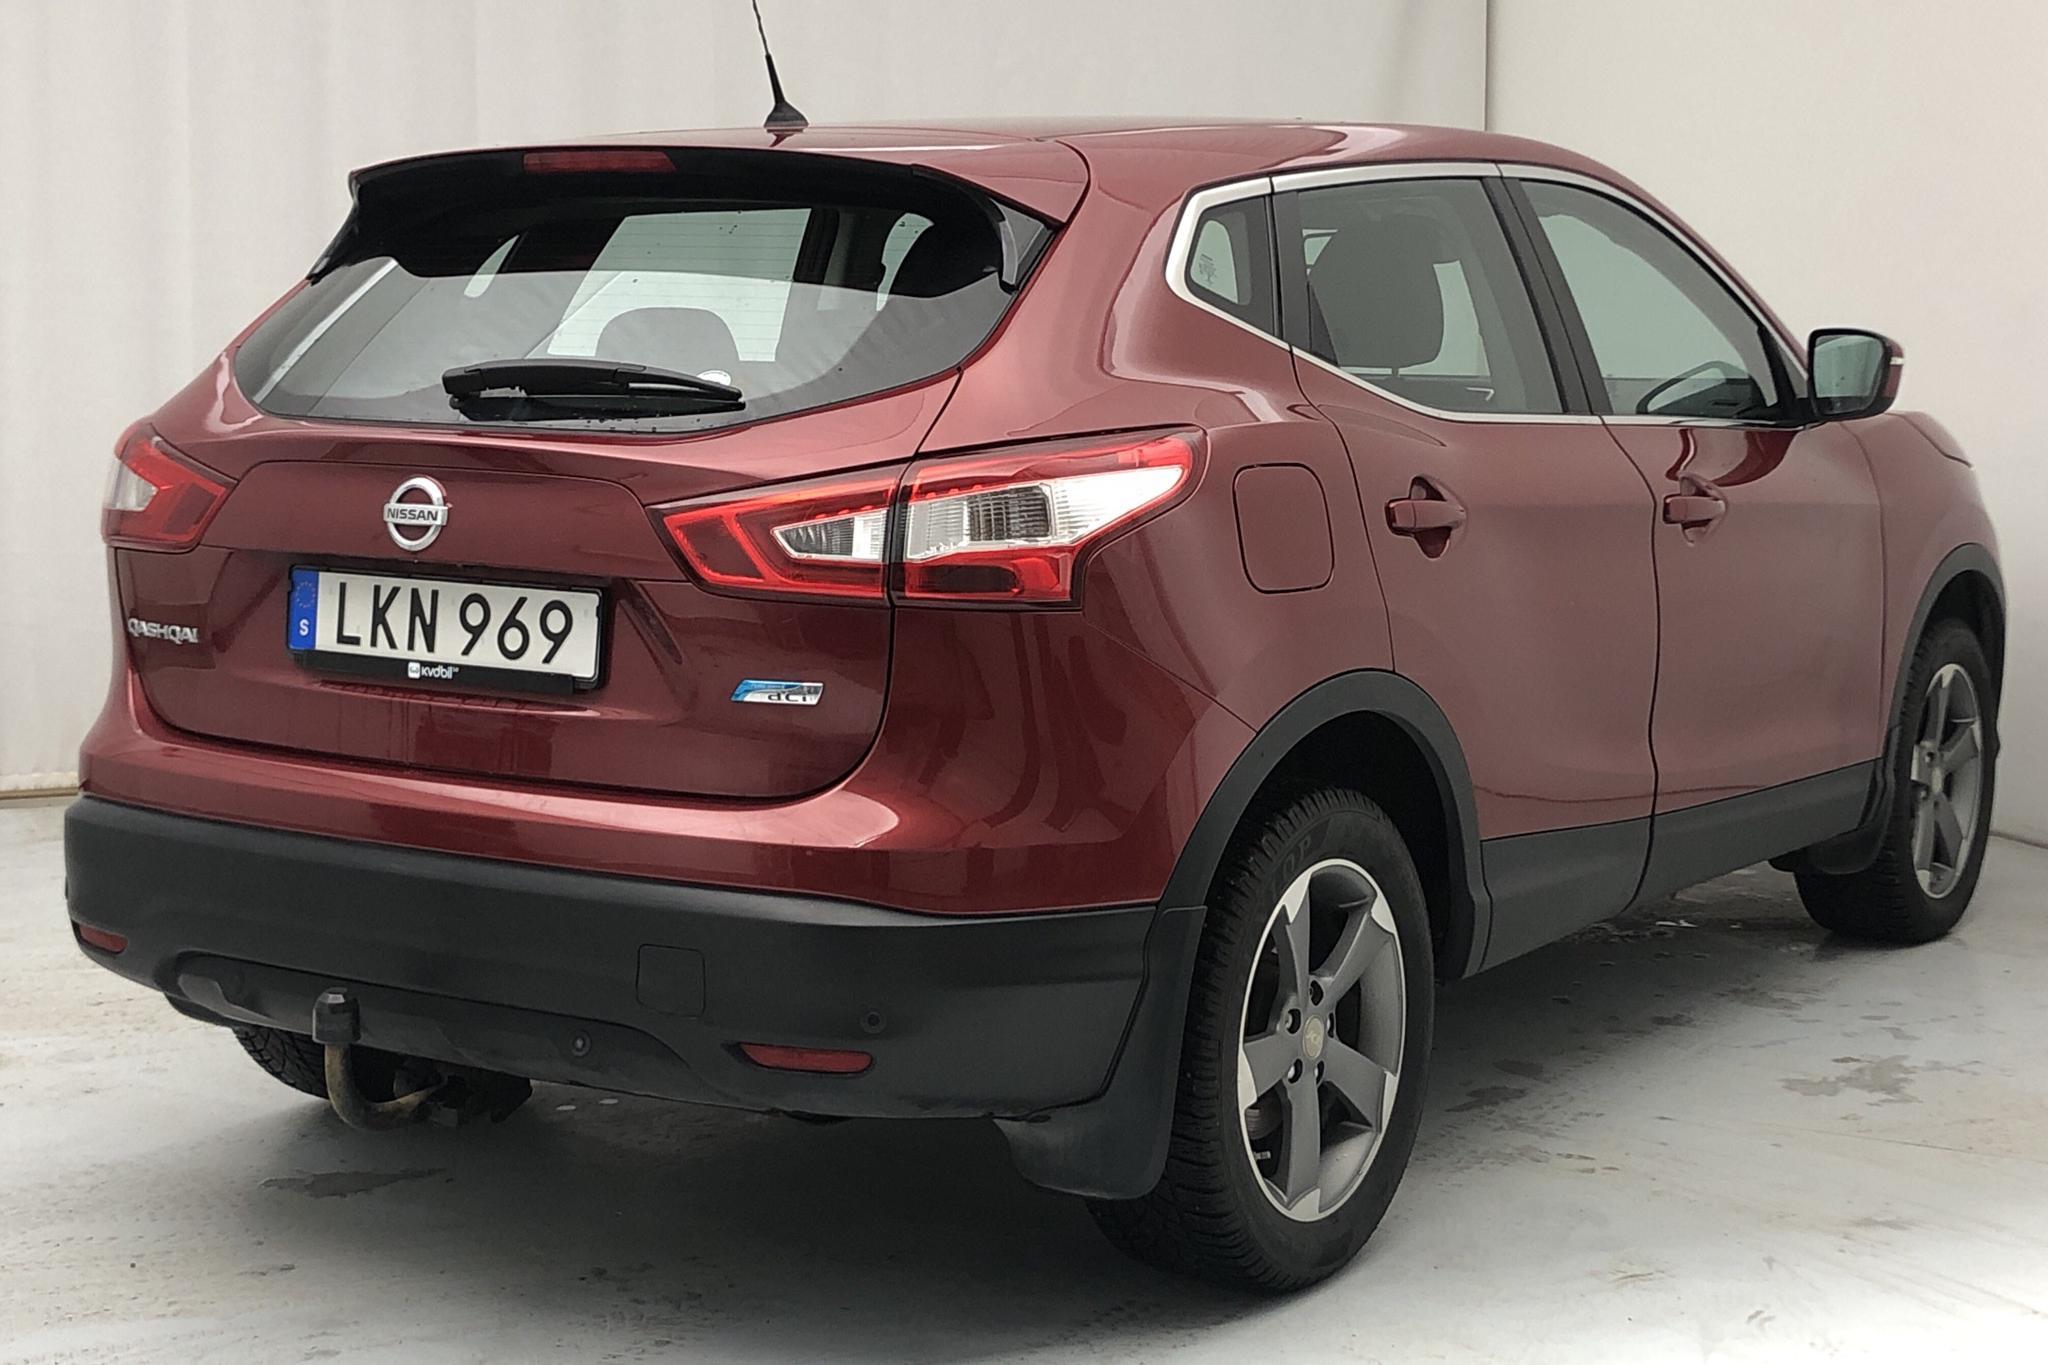 Nissan Qashqai 1.5 dCi (110hk) - 113 930 km - Manual - red - 2014